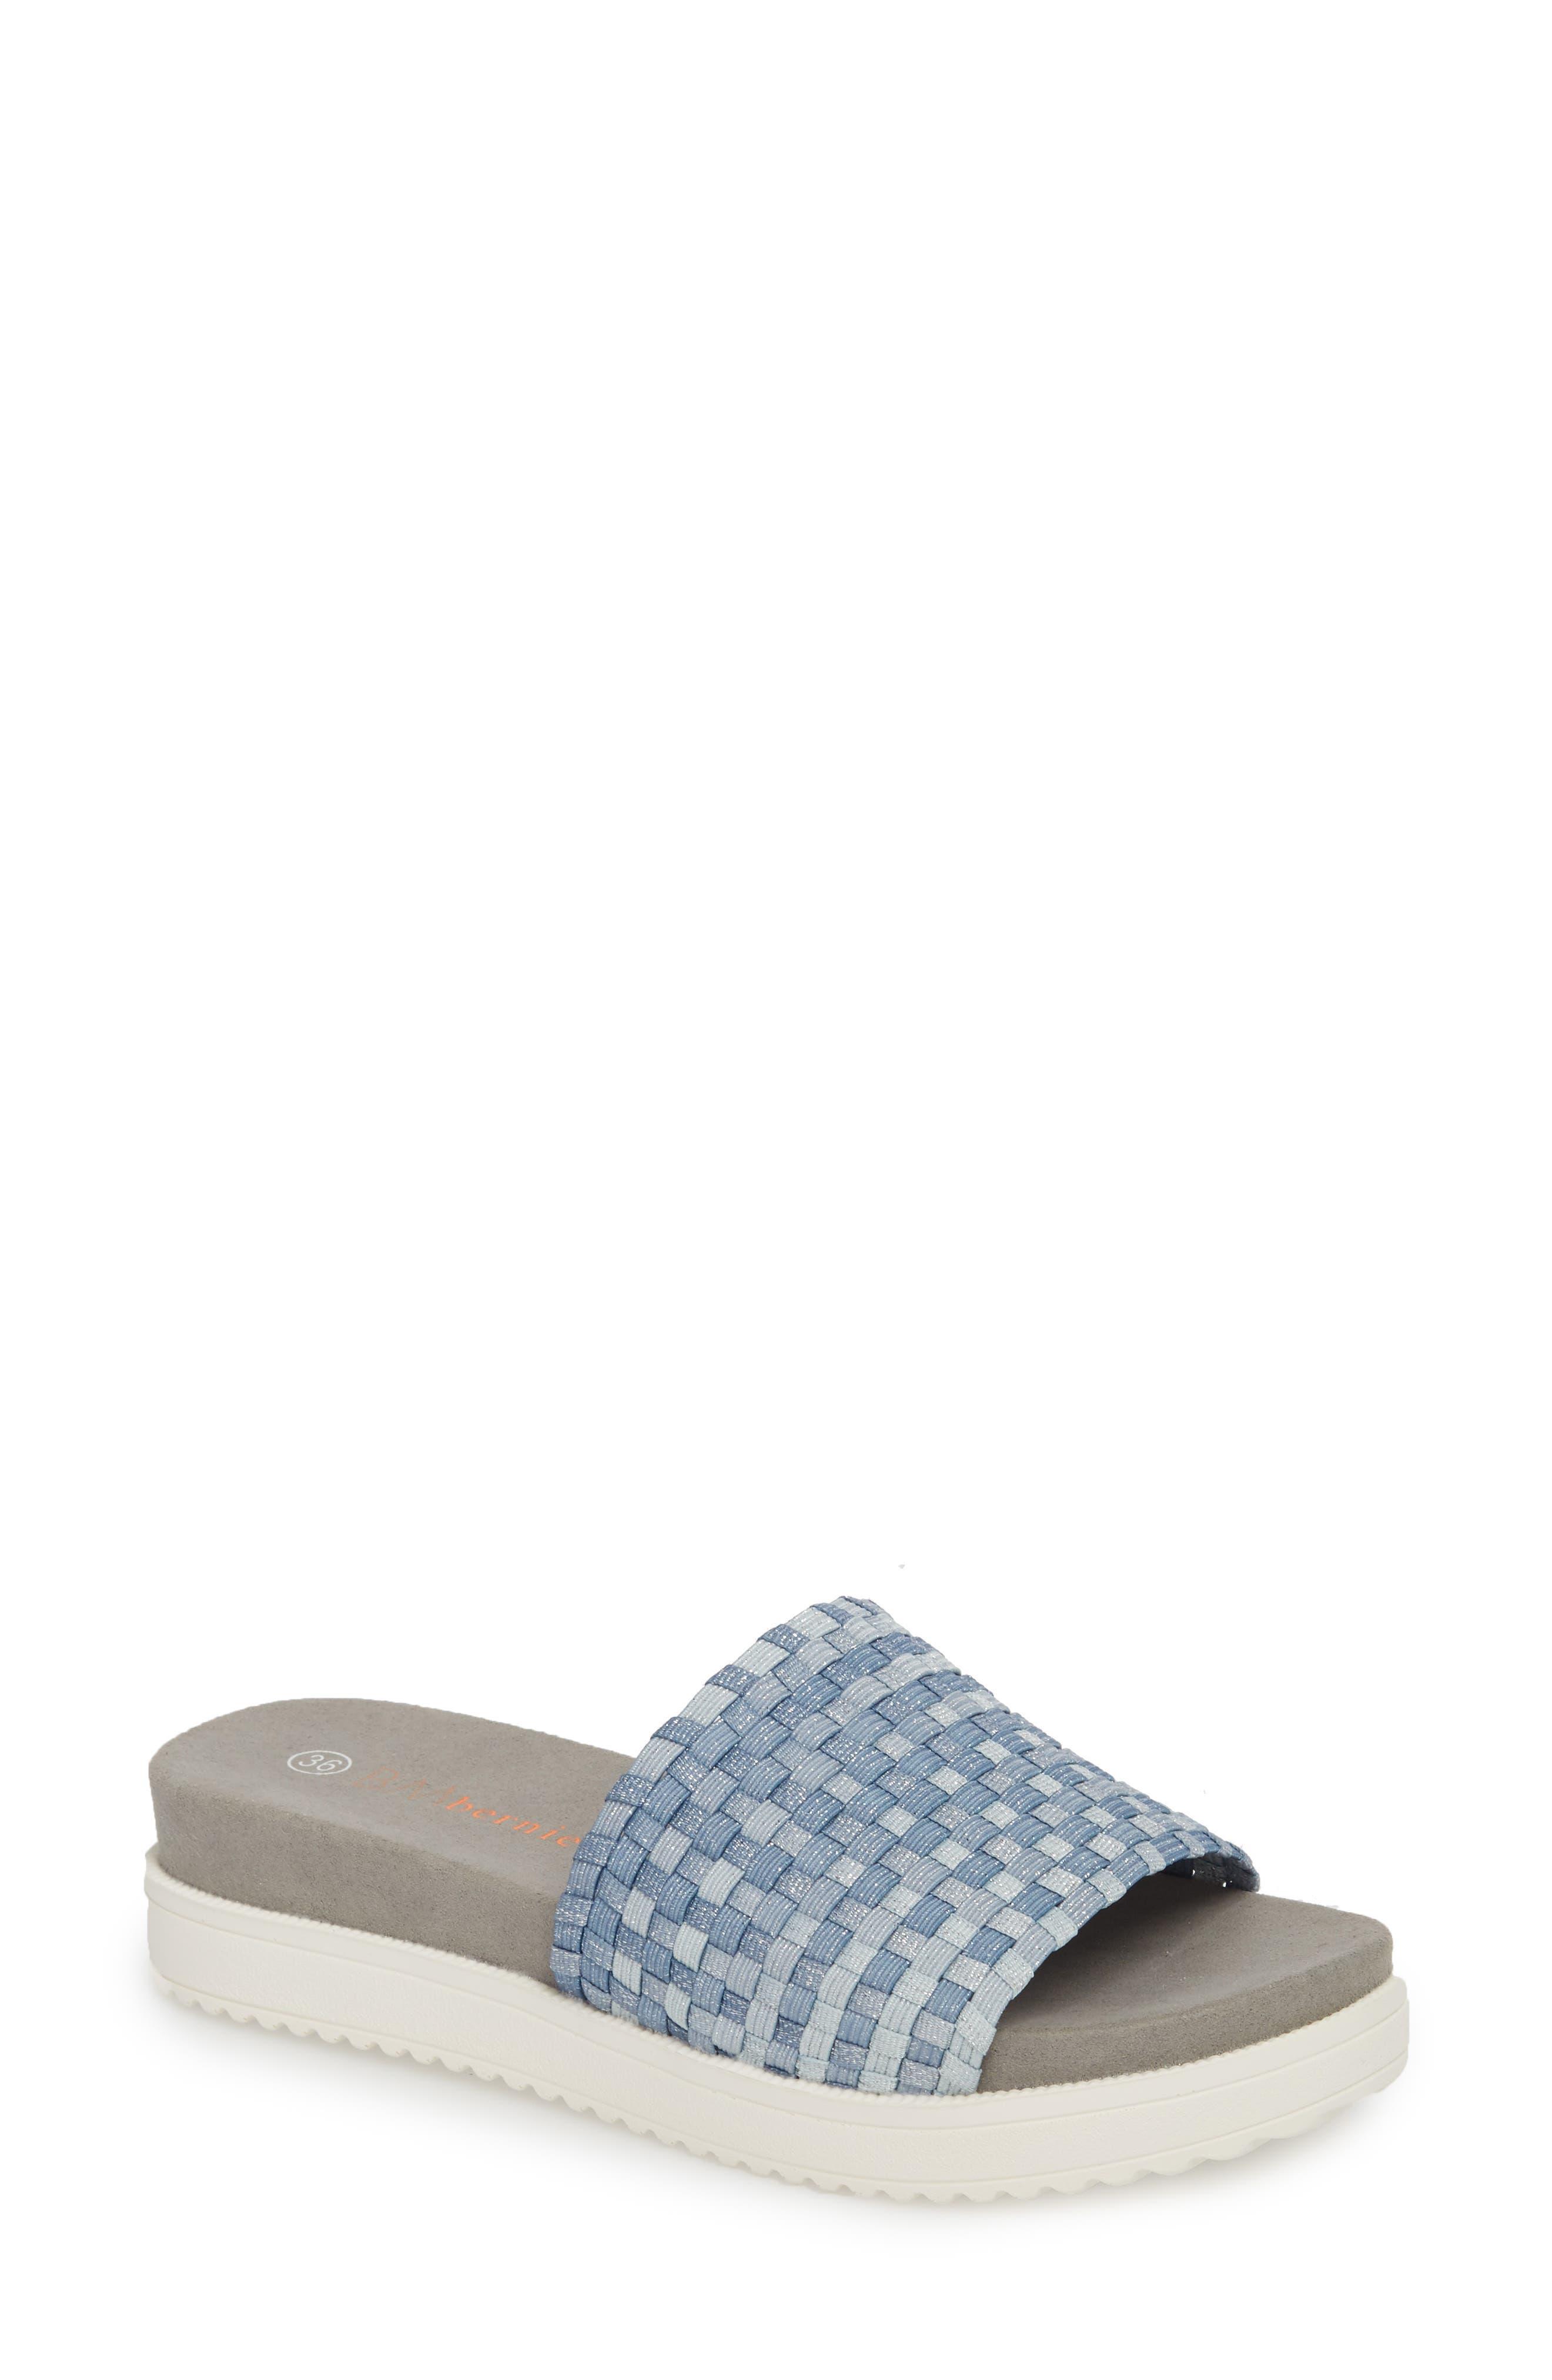 BERNIE MEV. Capri Slide Sandal, Main, color, CLOUD SHIMMER FABRIC